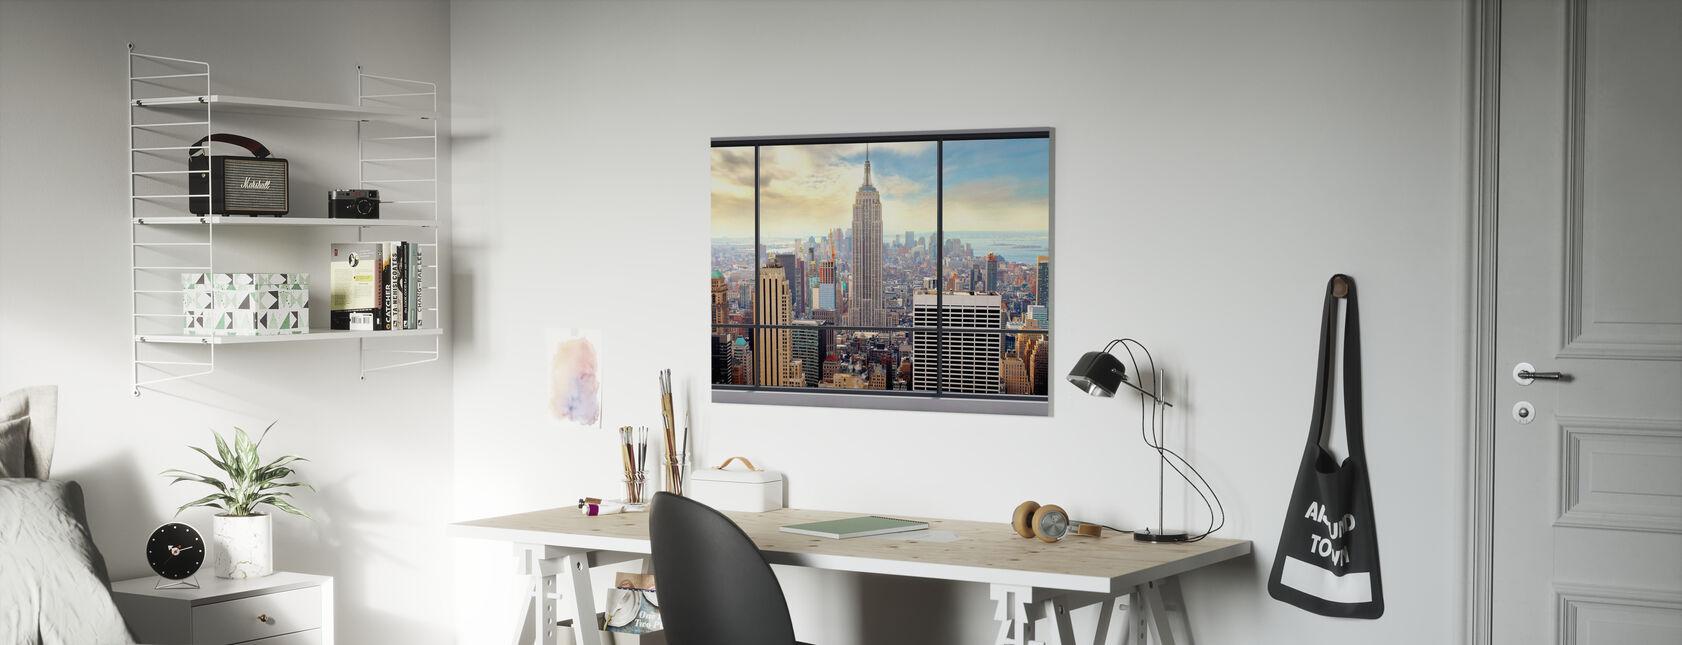 Penthouse Raam Uitzicht - Canvas print - Kinderkamer